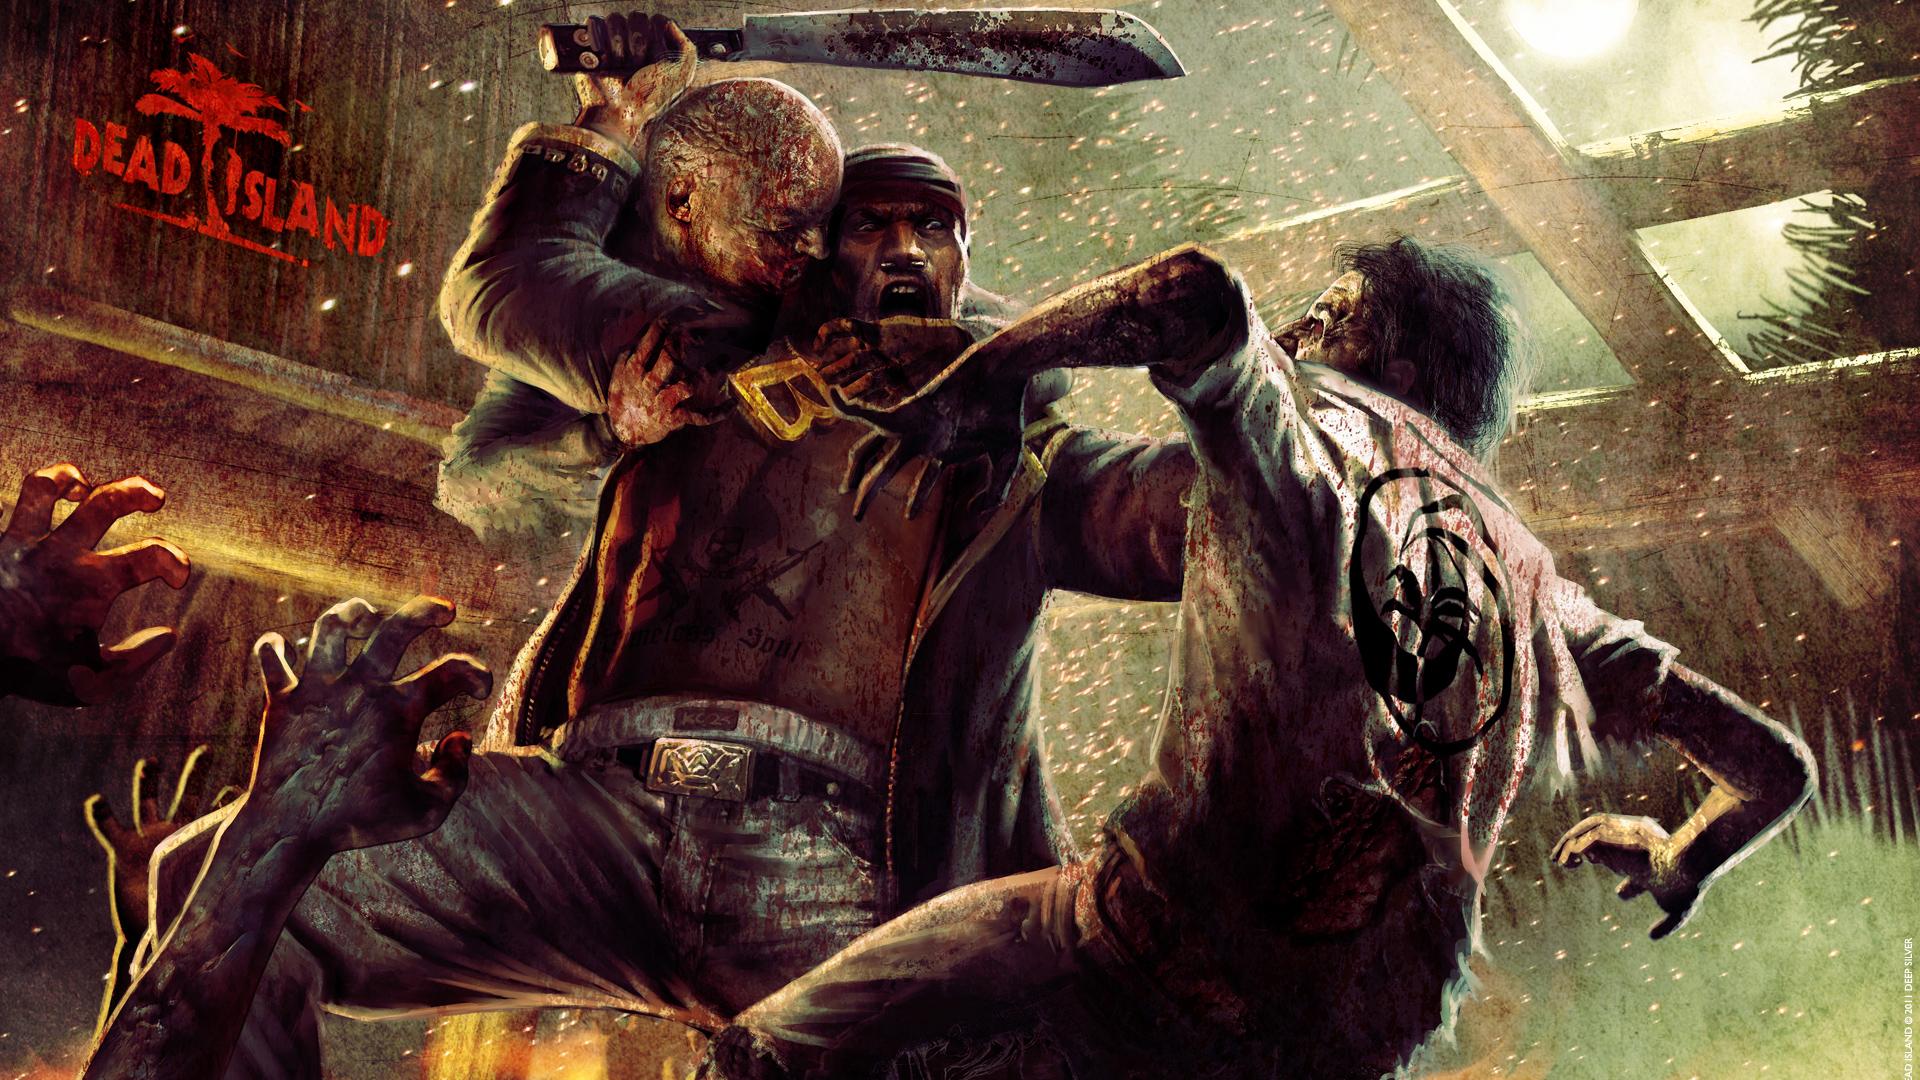 Dead Island 2 Wallpapers | HD Wallpapers